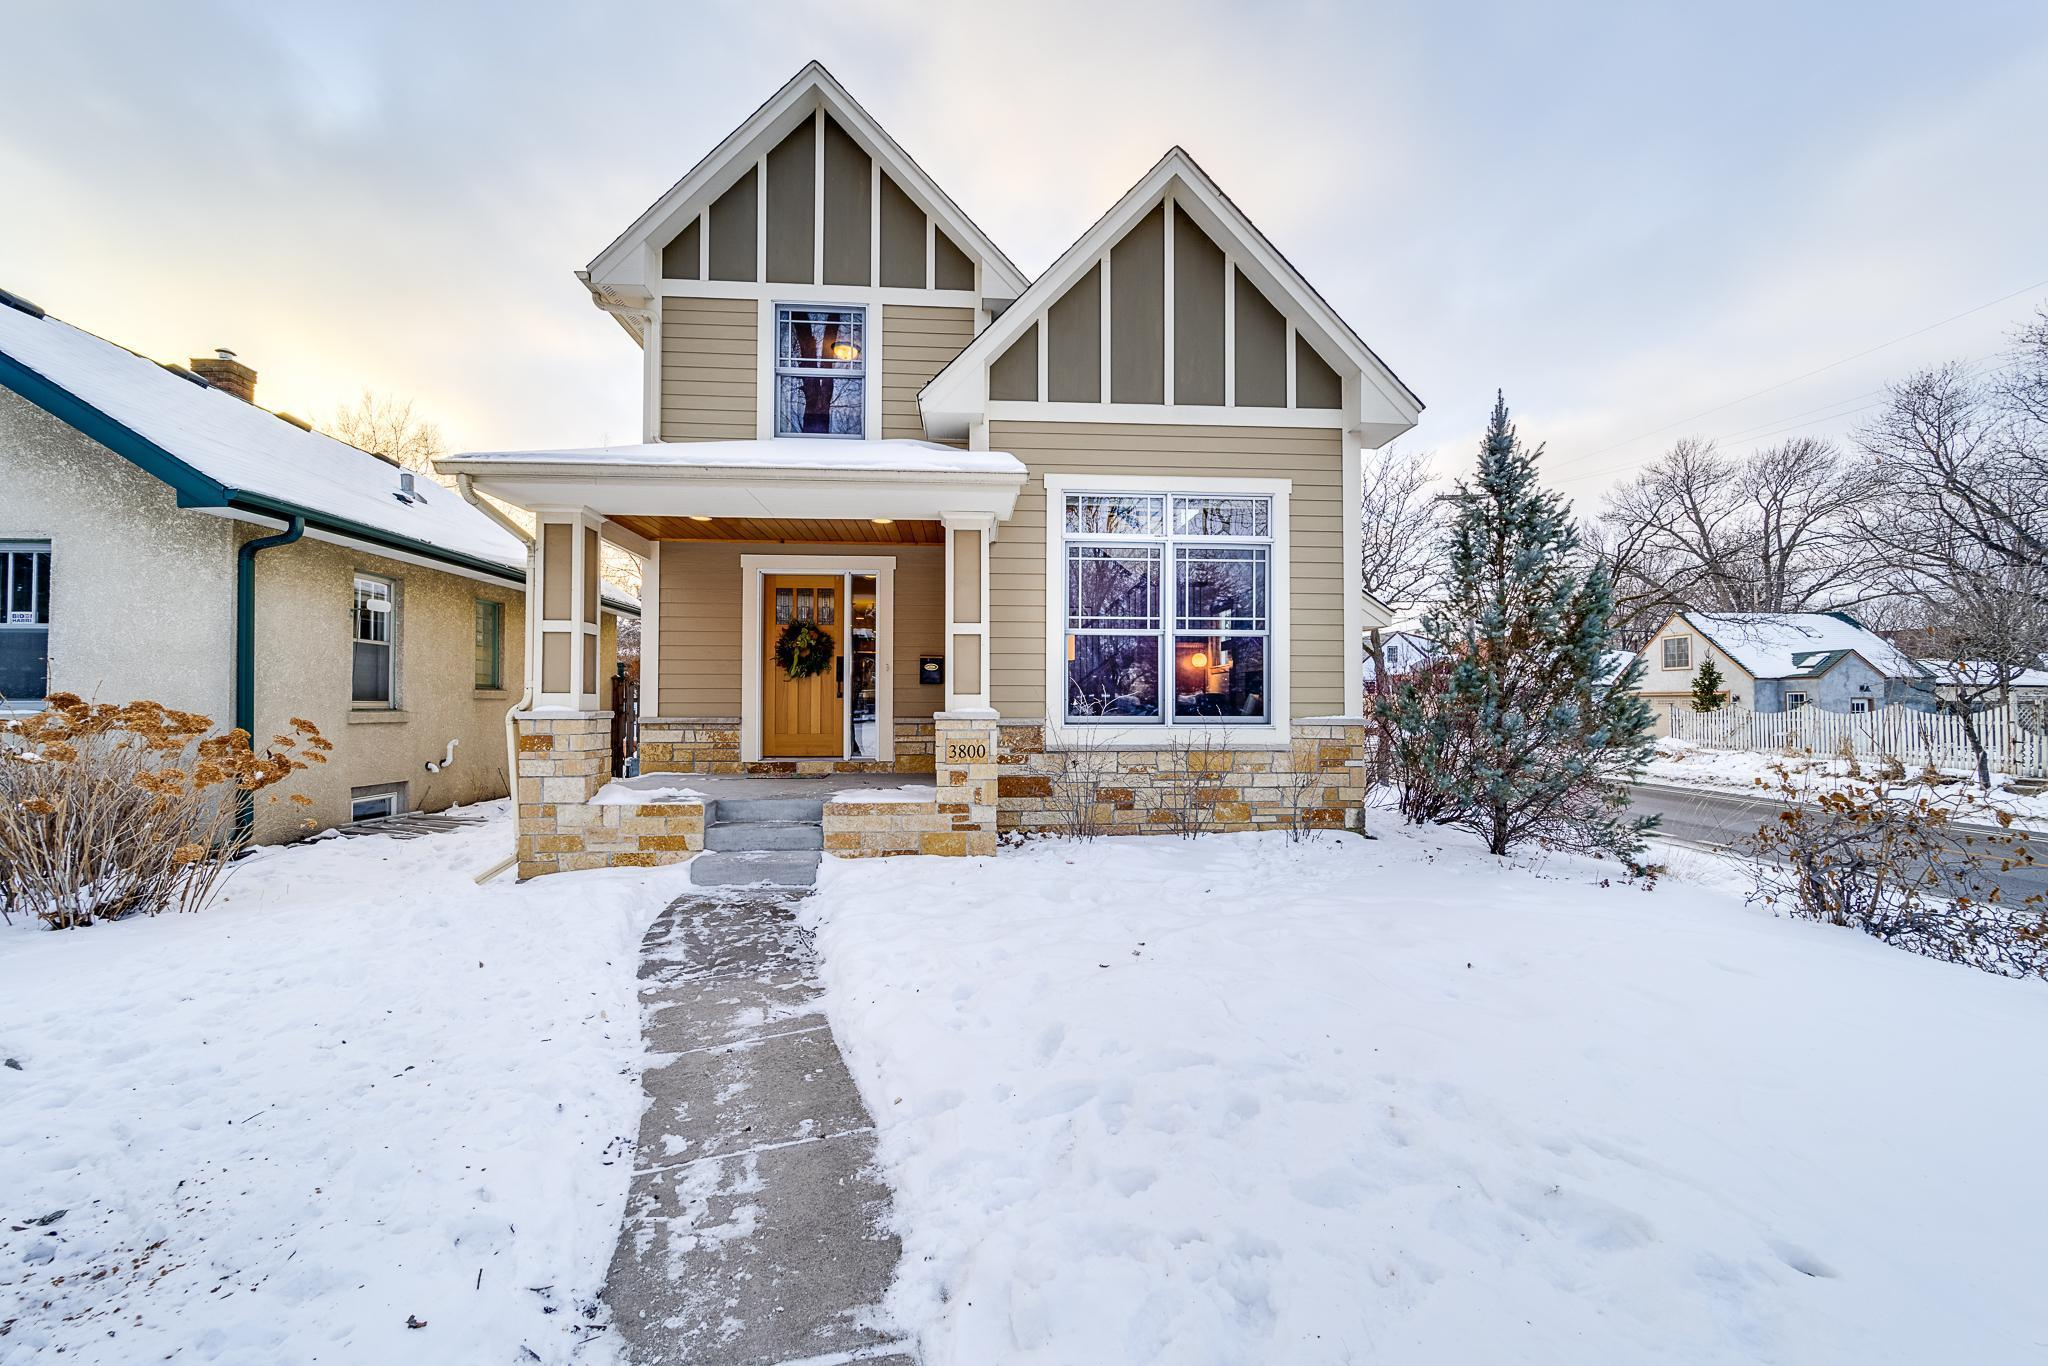 3800 46th Avenue S Property Photo - Minneapolis, MN real estate listing